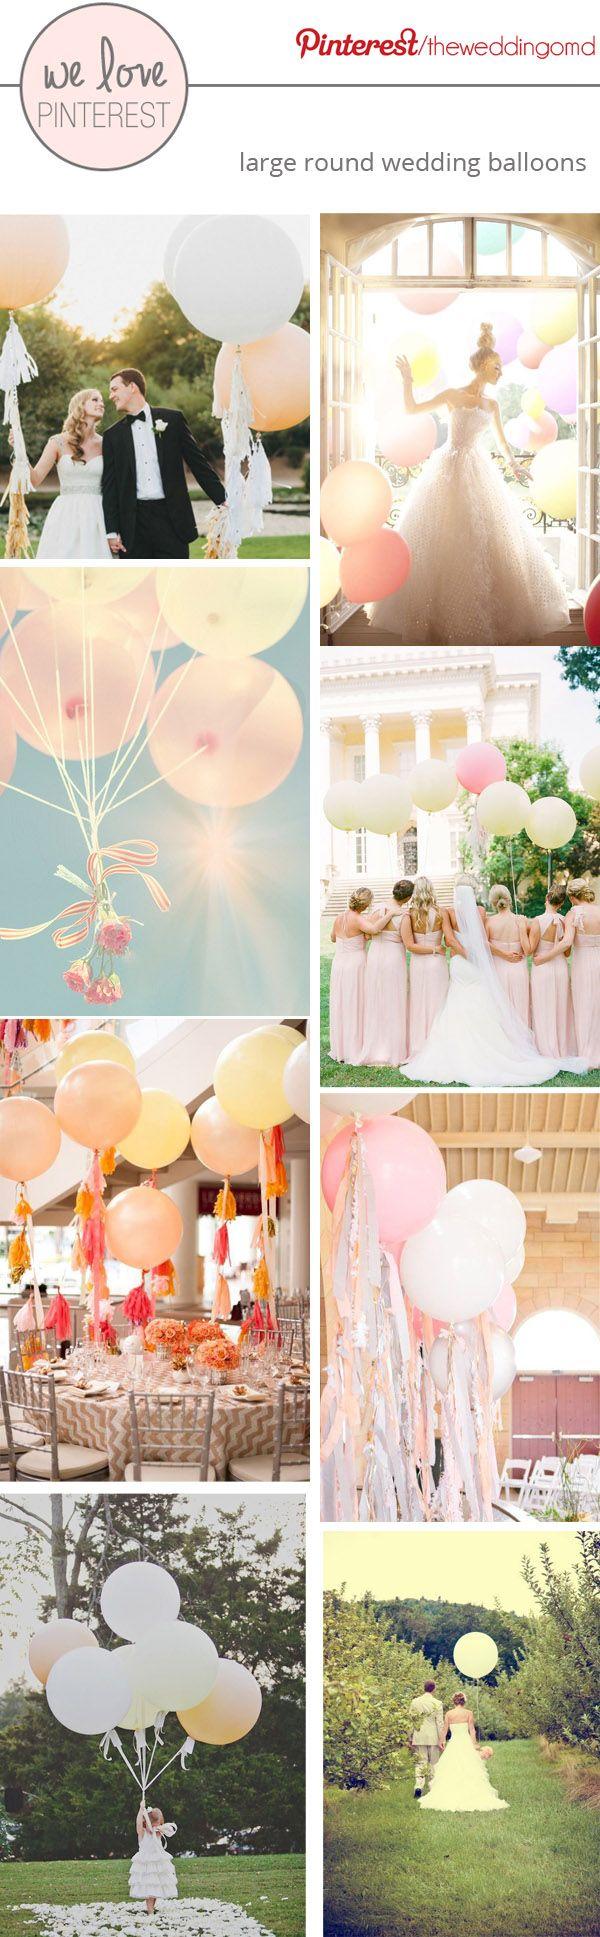 Large Wedding Balloons ~ Effortless Romance #wedding #balloons